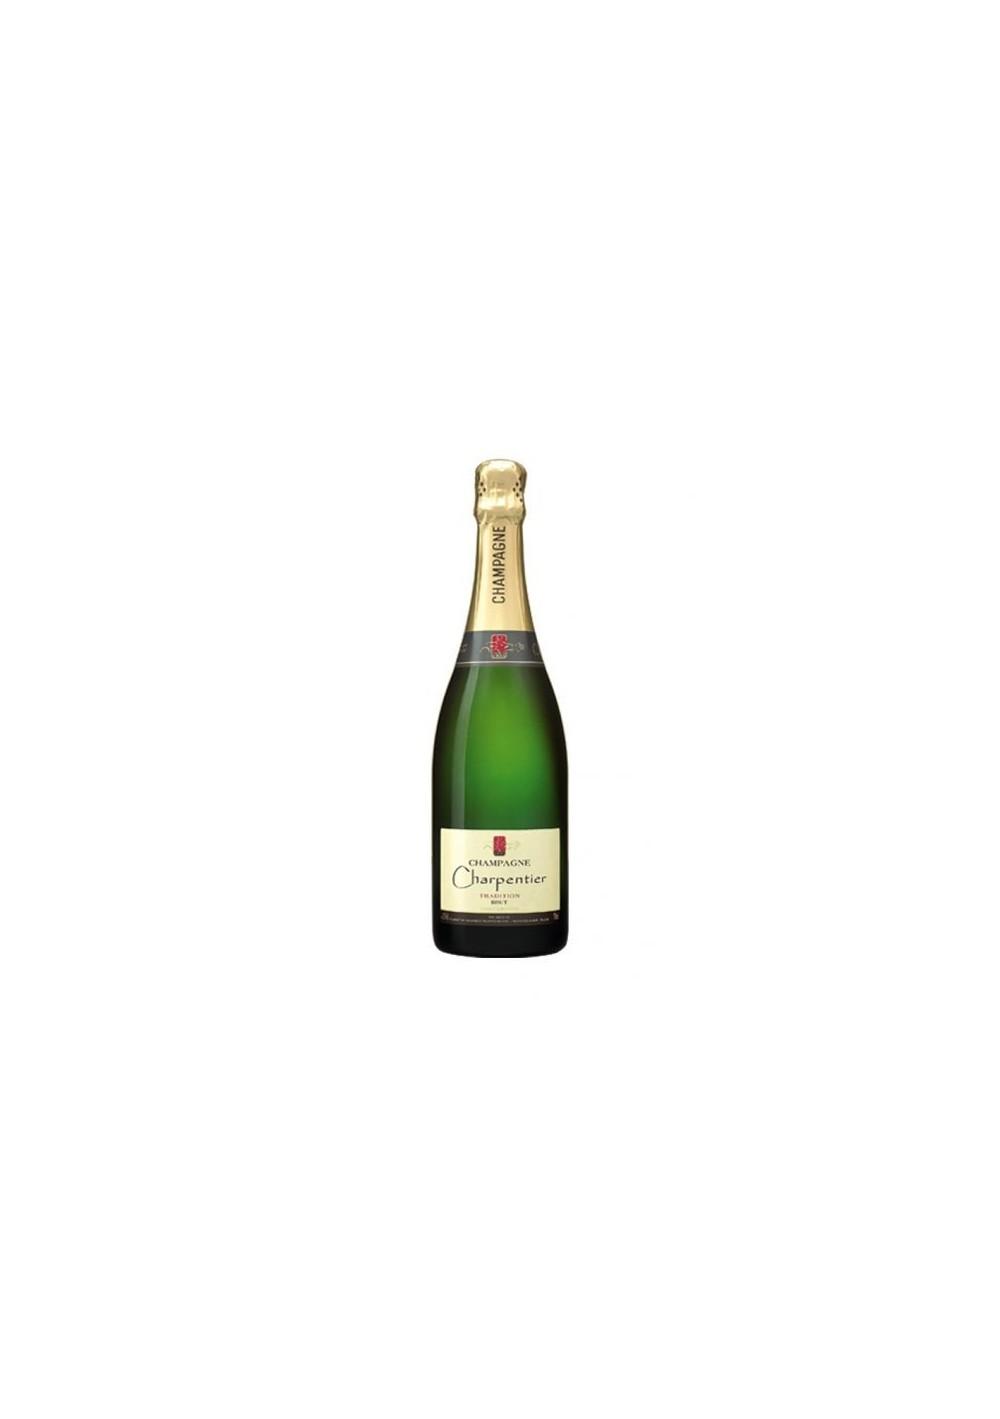 Champagne Brut Tradition - Charpentier